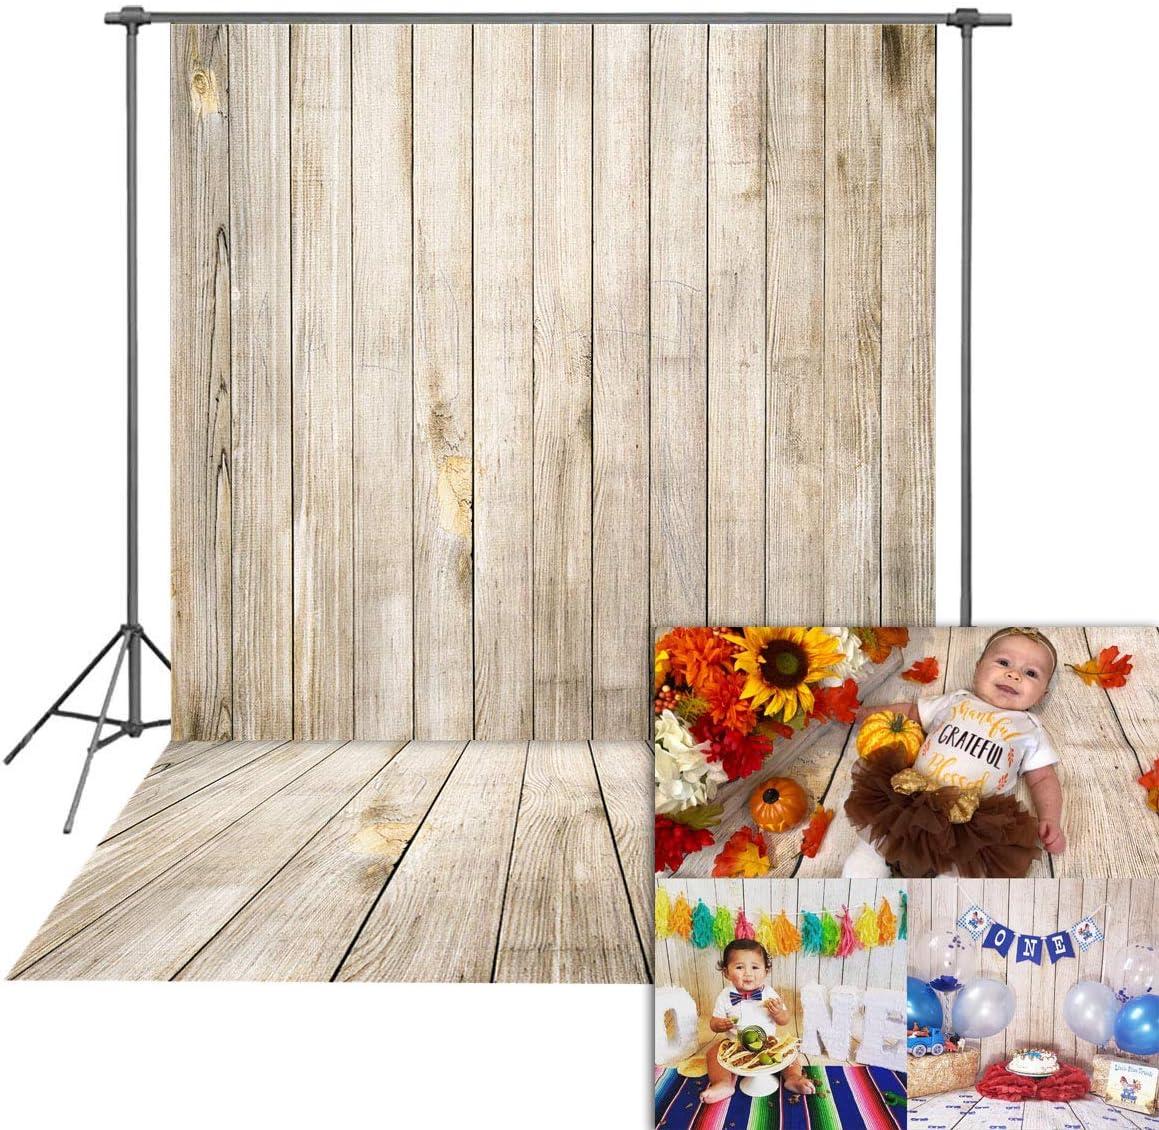 Zhy Daniu Backdrops Christmas for Baby Studio Props Socks Gifts Kids Photography Background Vinyl 7x5FT Daniu-Christmas064